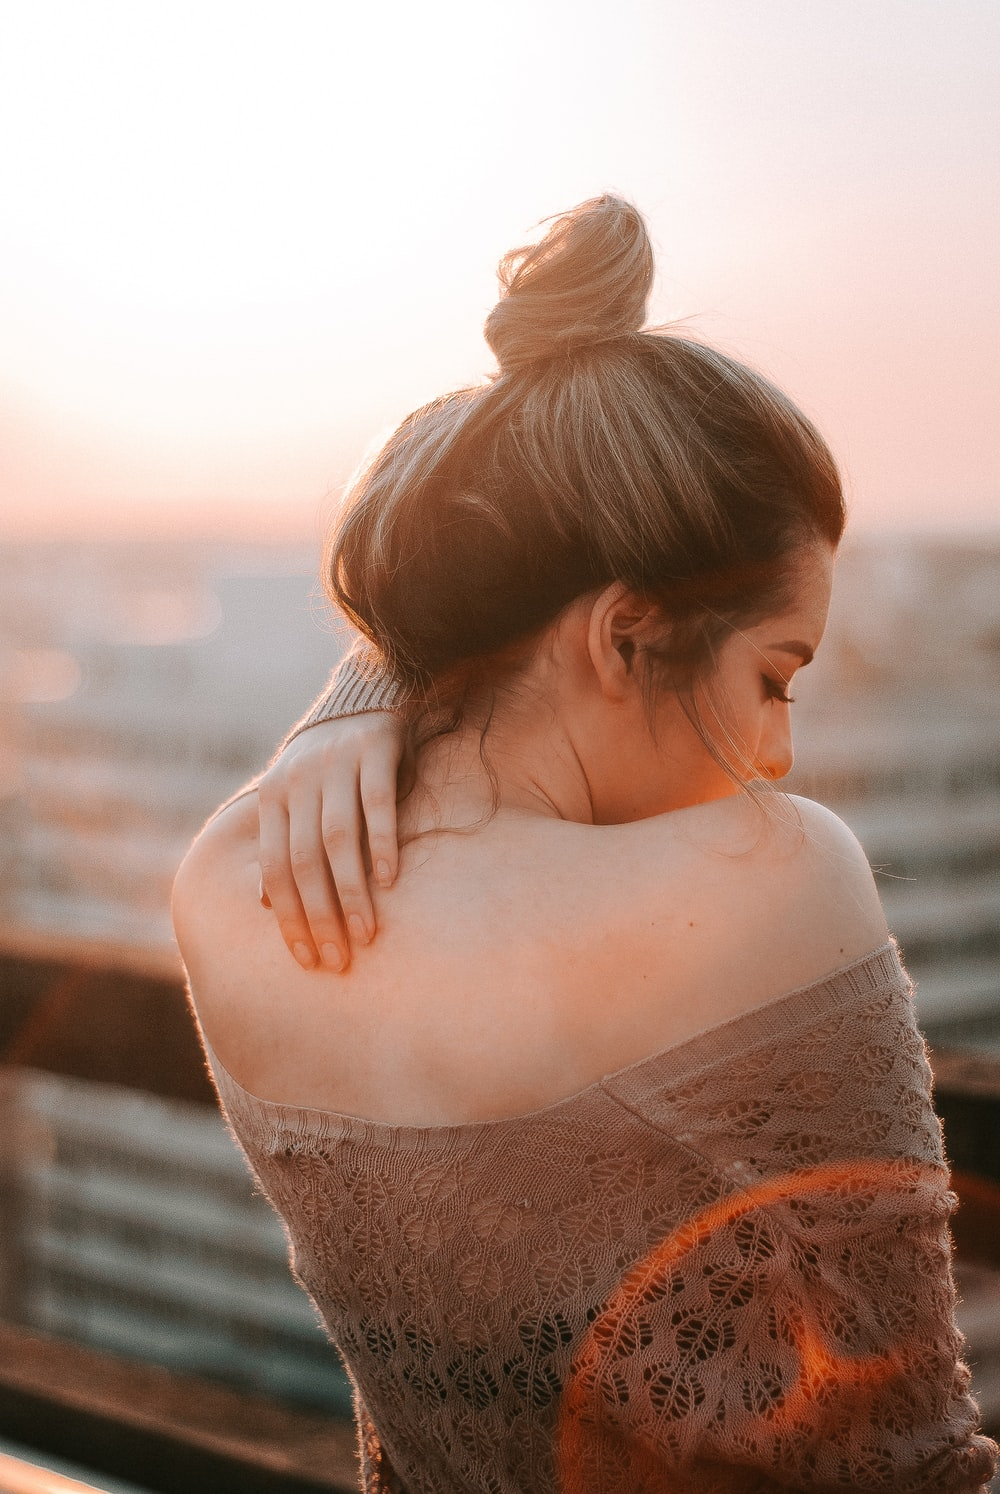 woman in beige lace top